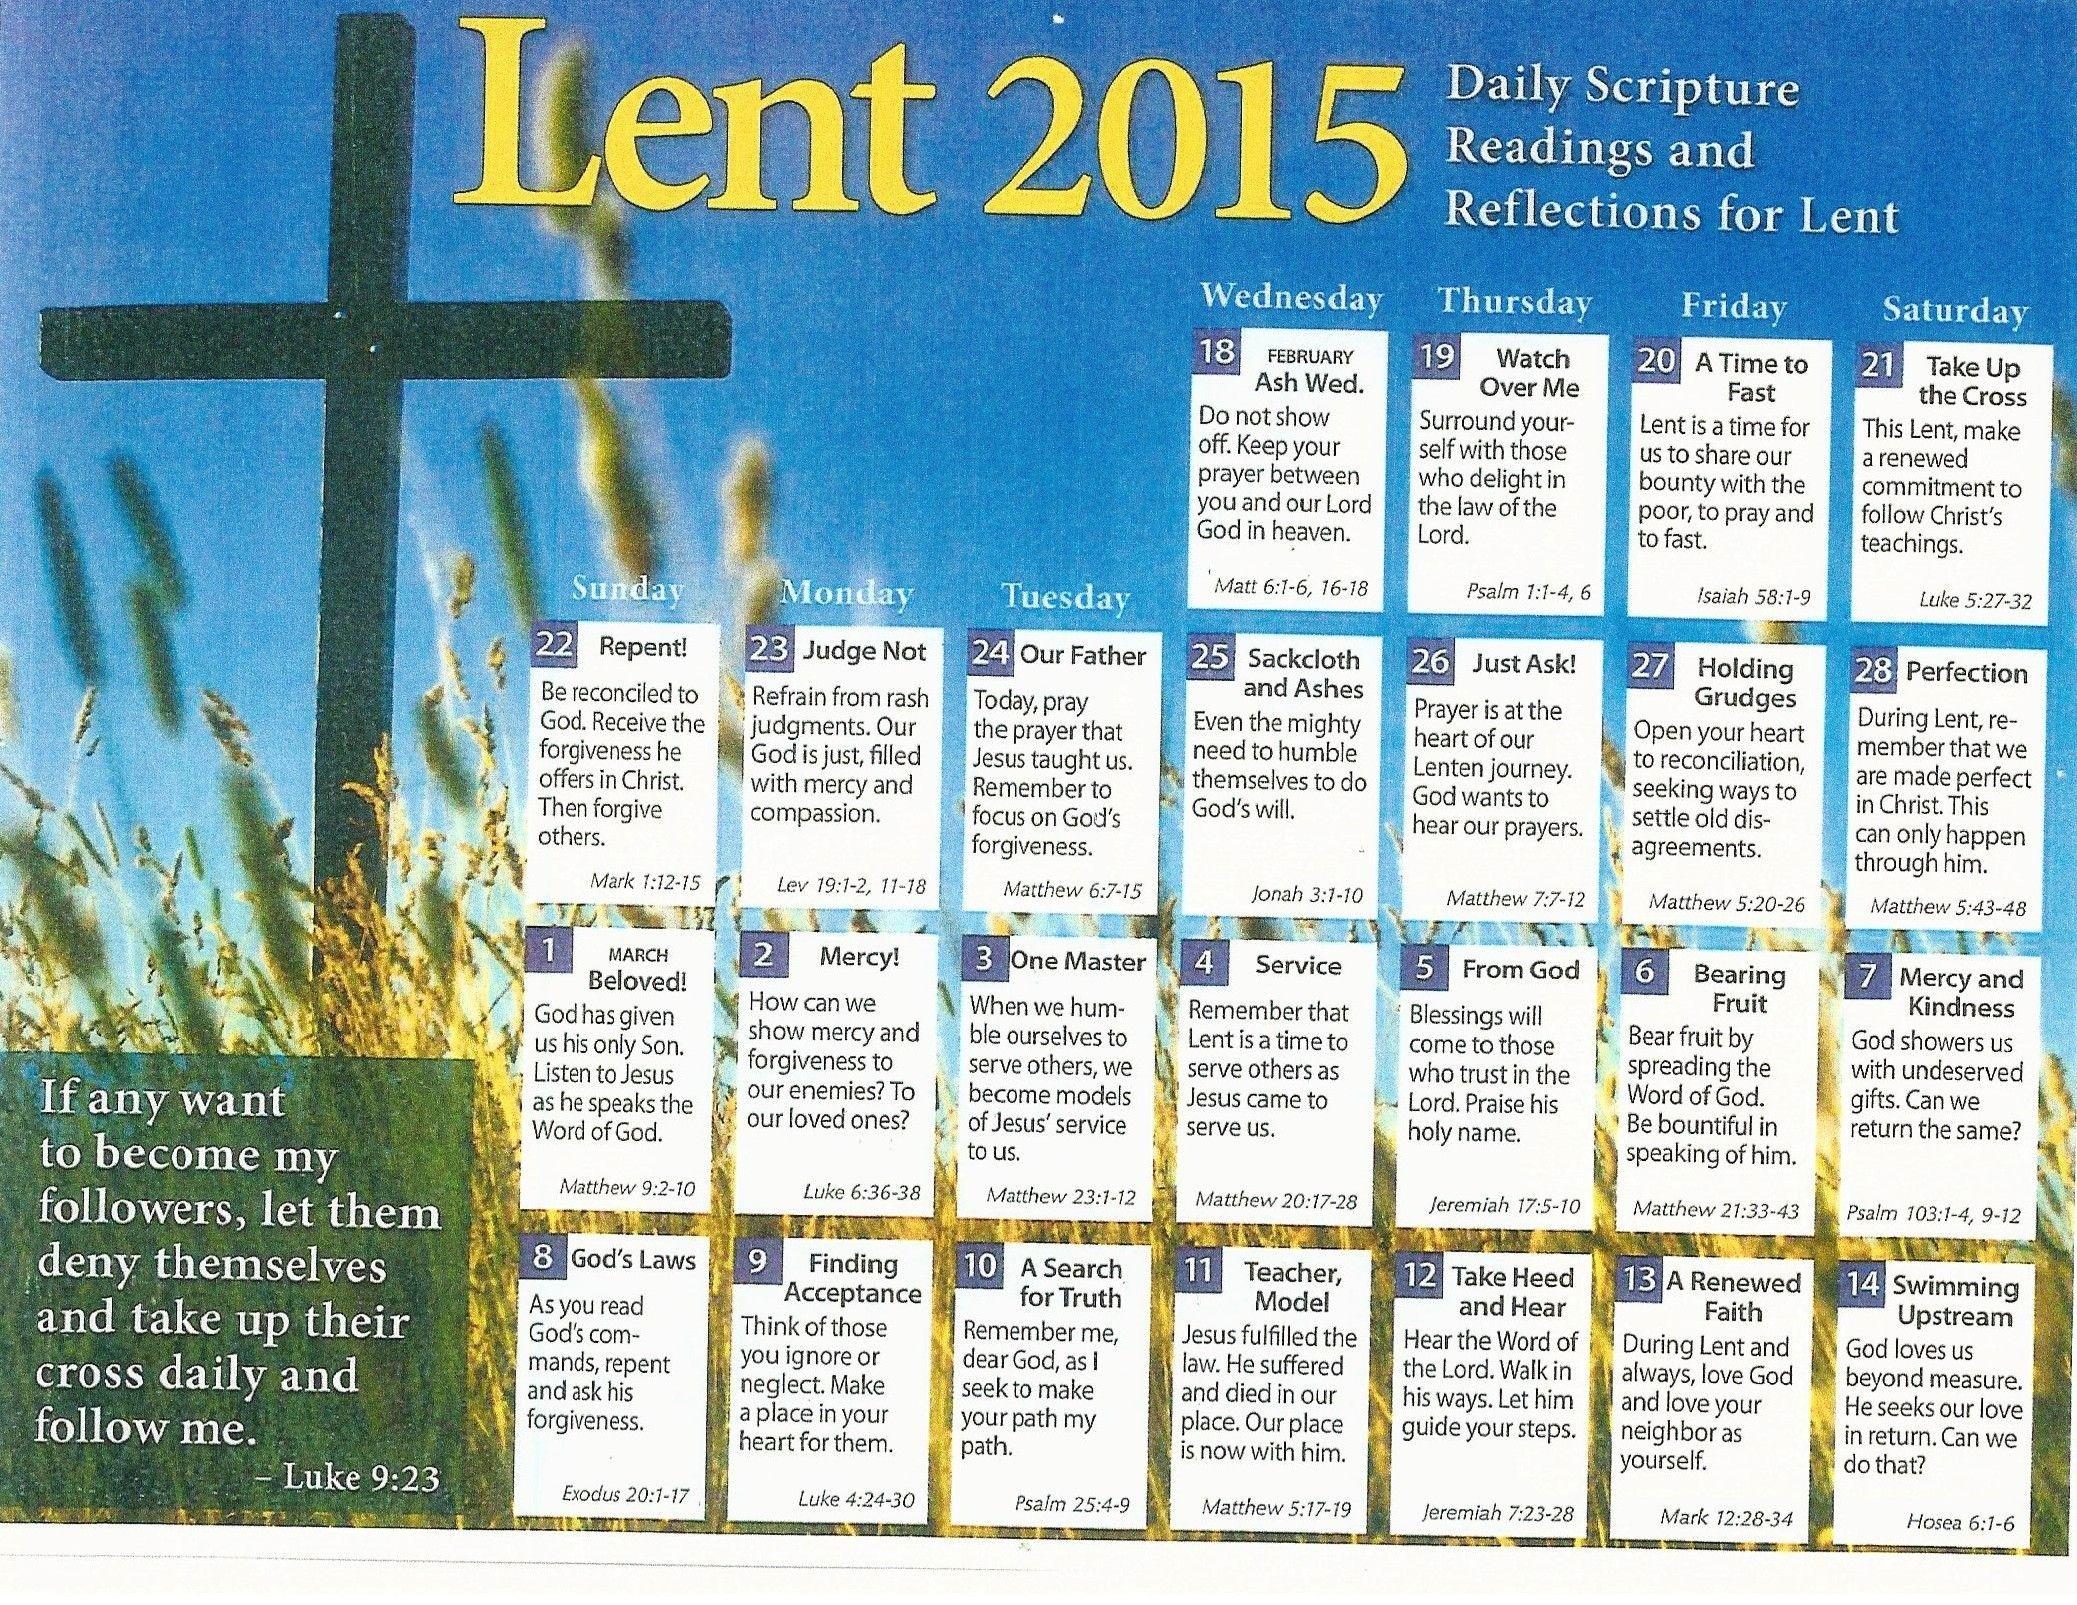 Methodist Liturgical Calendar 2016 | Lent, Calendar 2015  Methodist Liturgy Readings 2020